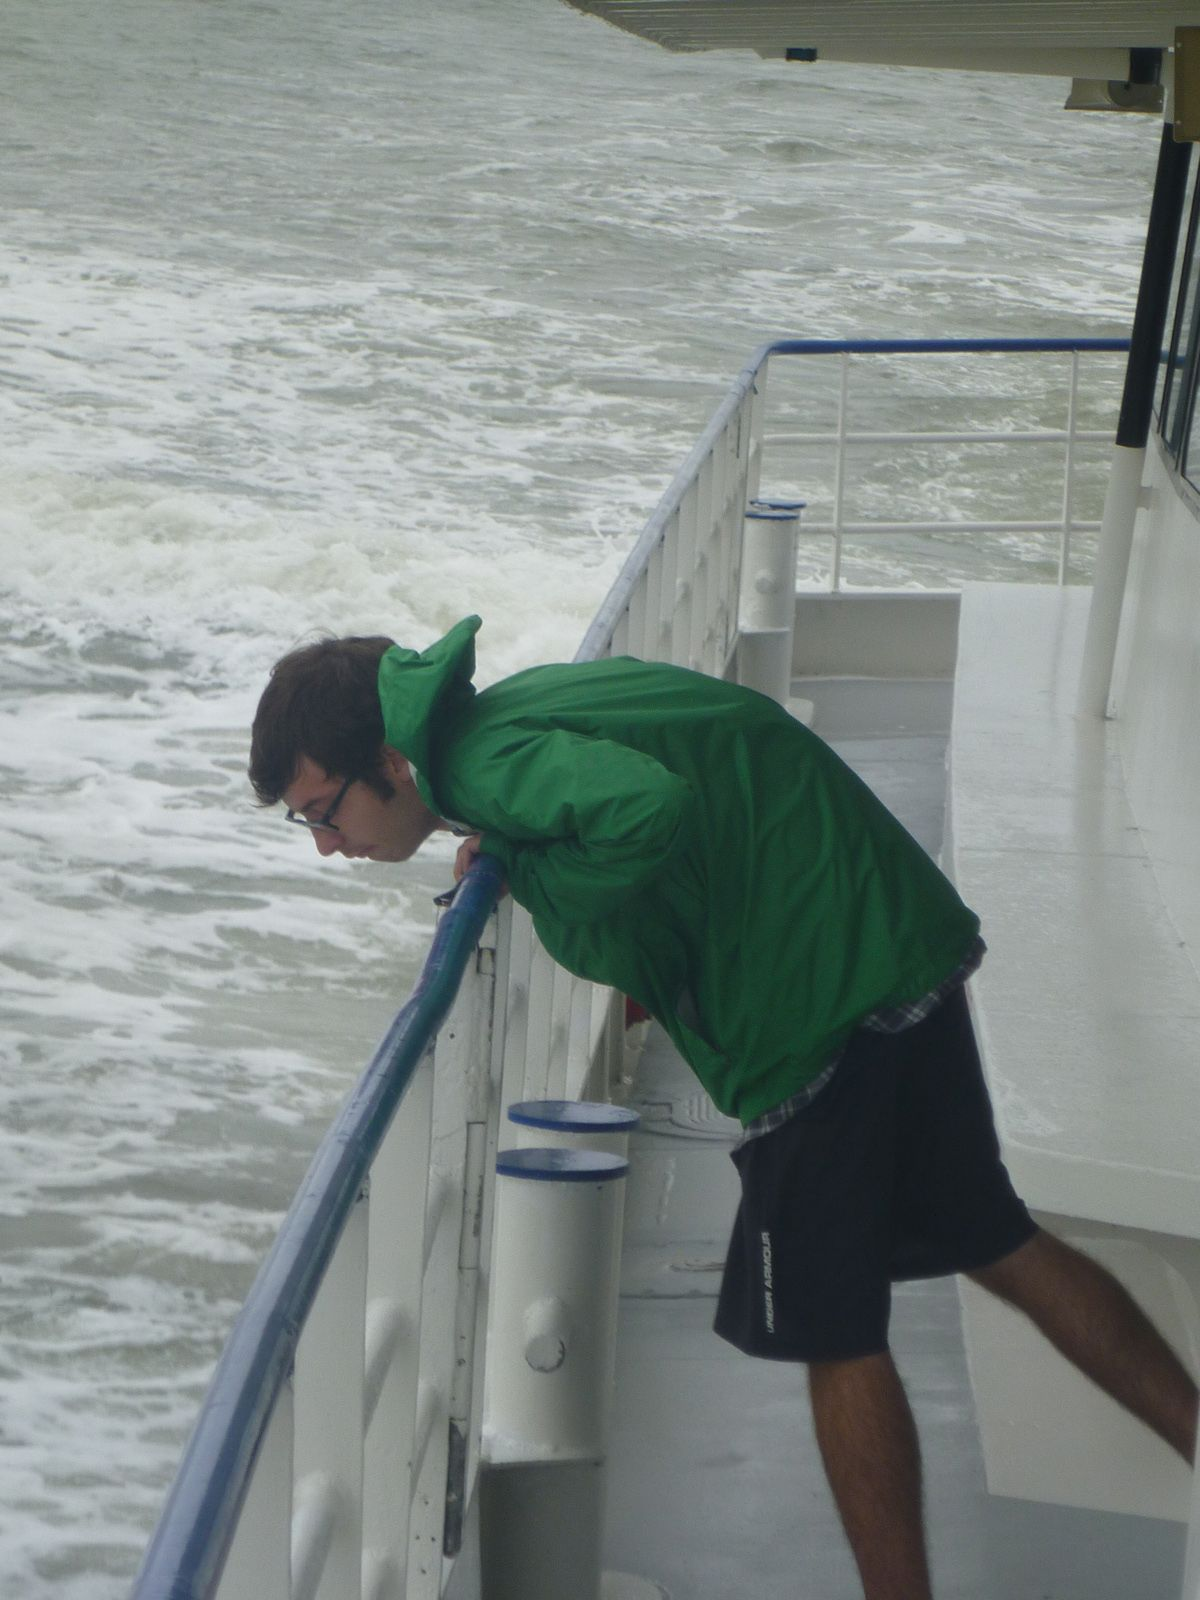 Christchurch School Photo Gallery Andrew Smith Bermuda Shorts Cokelat 30 Junior Immersion Trip 2013